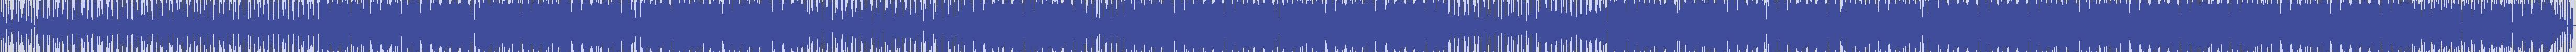 just_digital_records [JS1204] Maurizio Jave - Fluid Flow [Original Mix] audio wave form